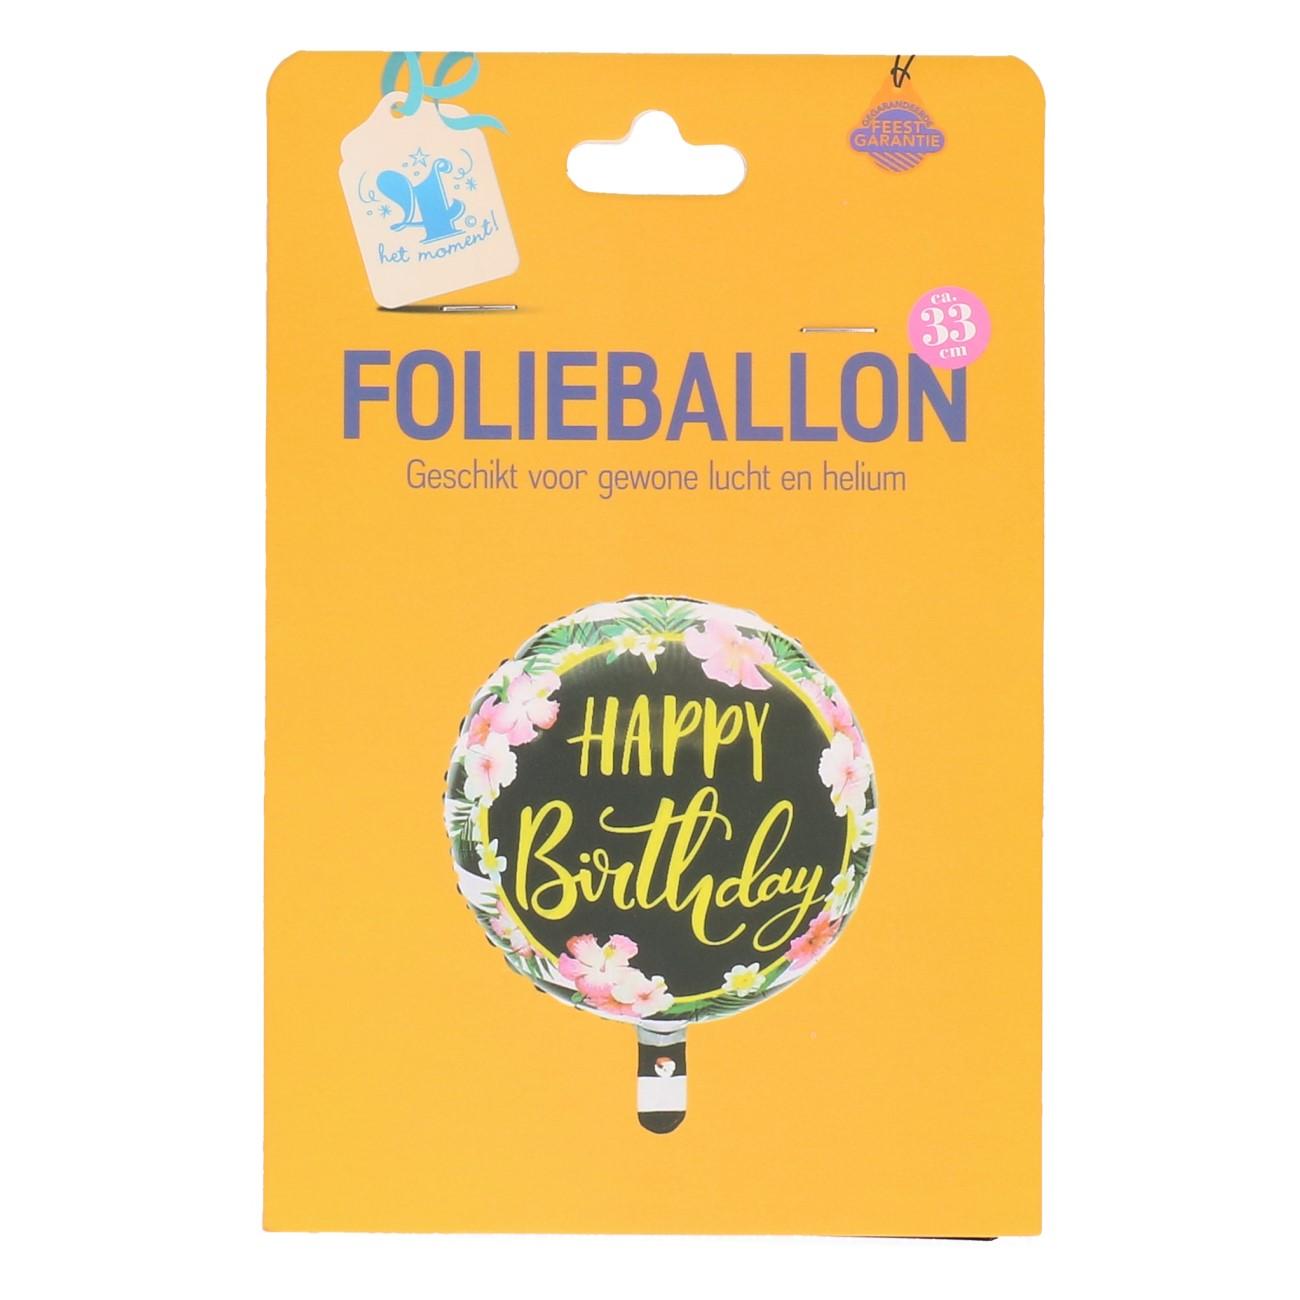 Folieballon happy birthday tropical